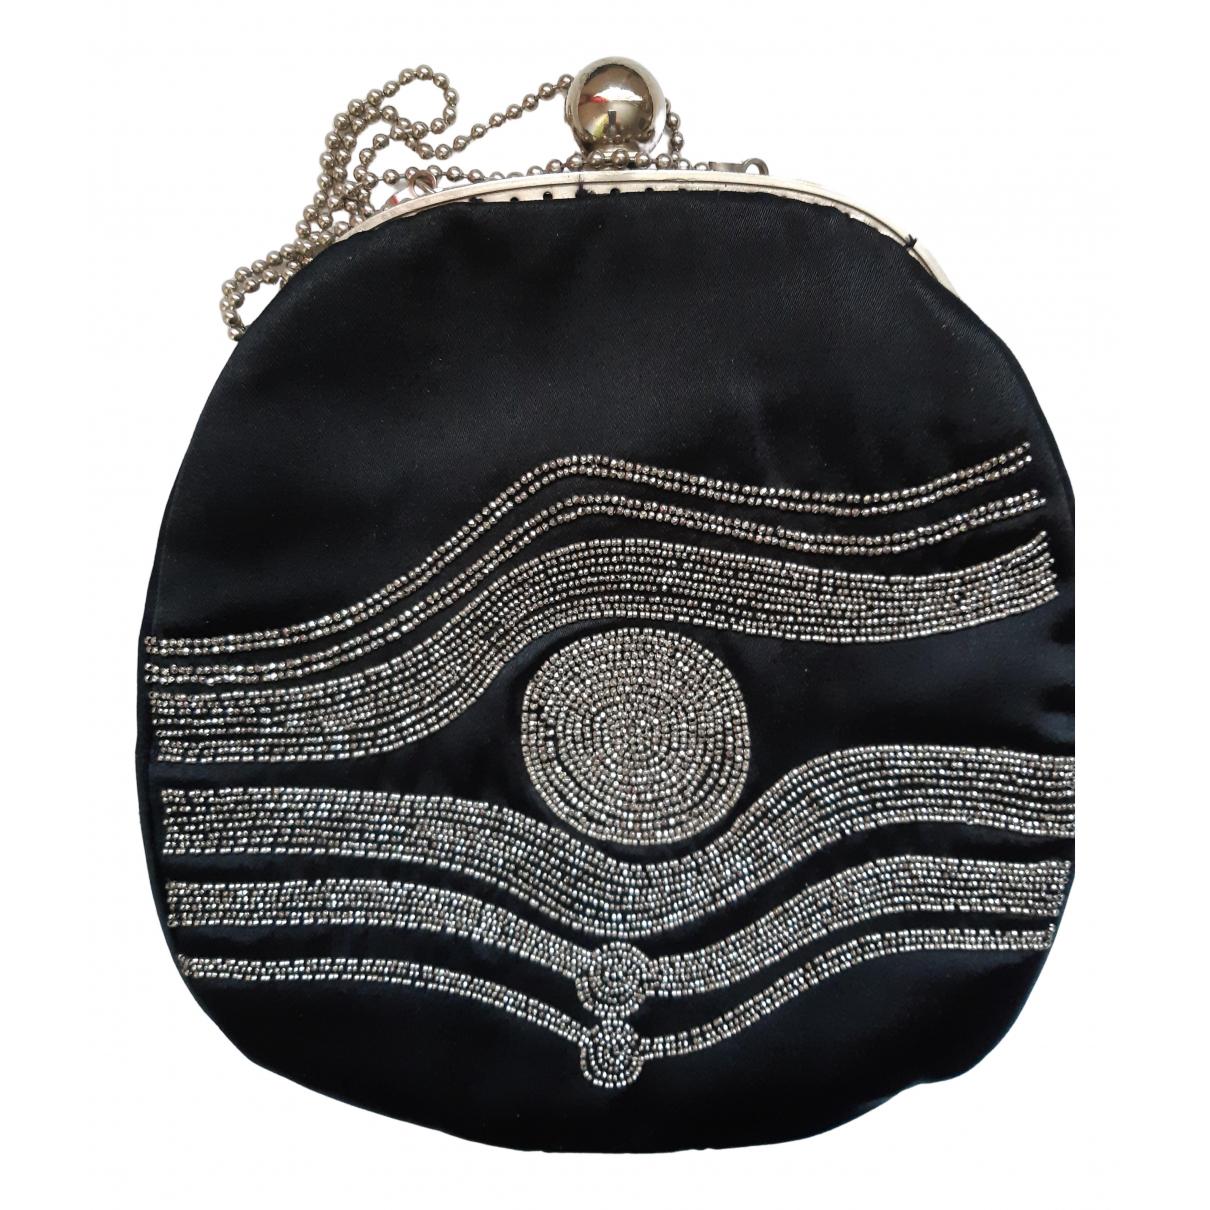 Pierre Cardin N Black handbag for Women N